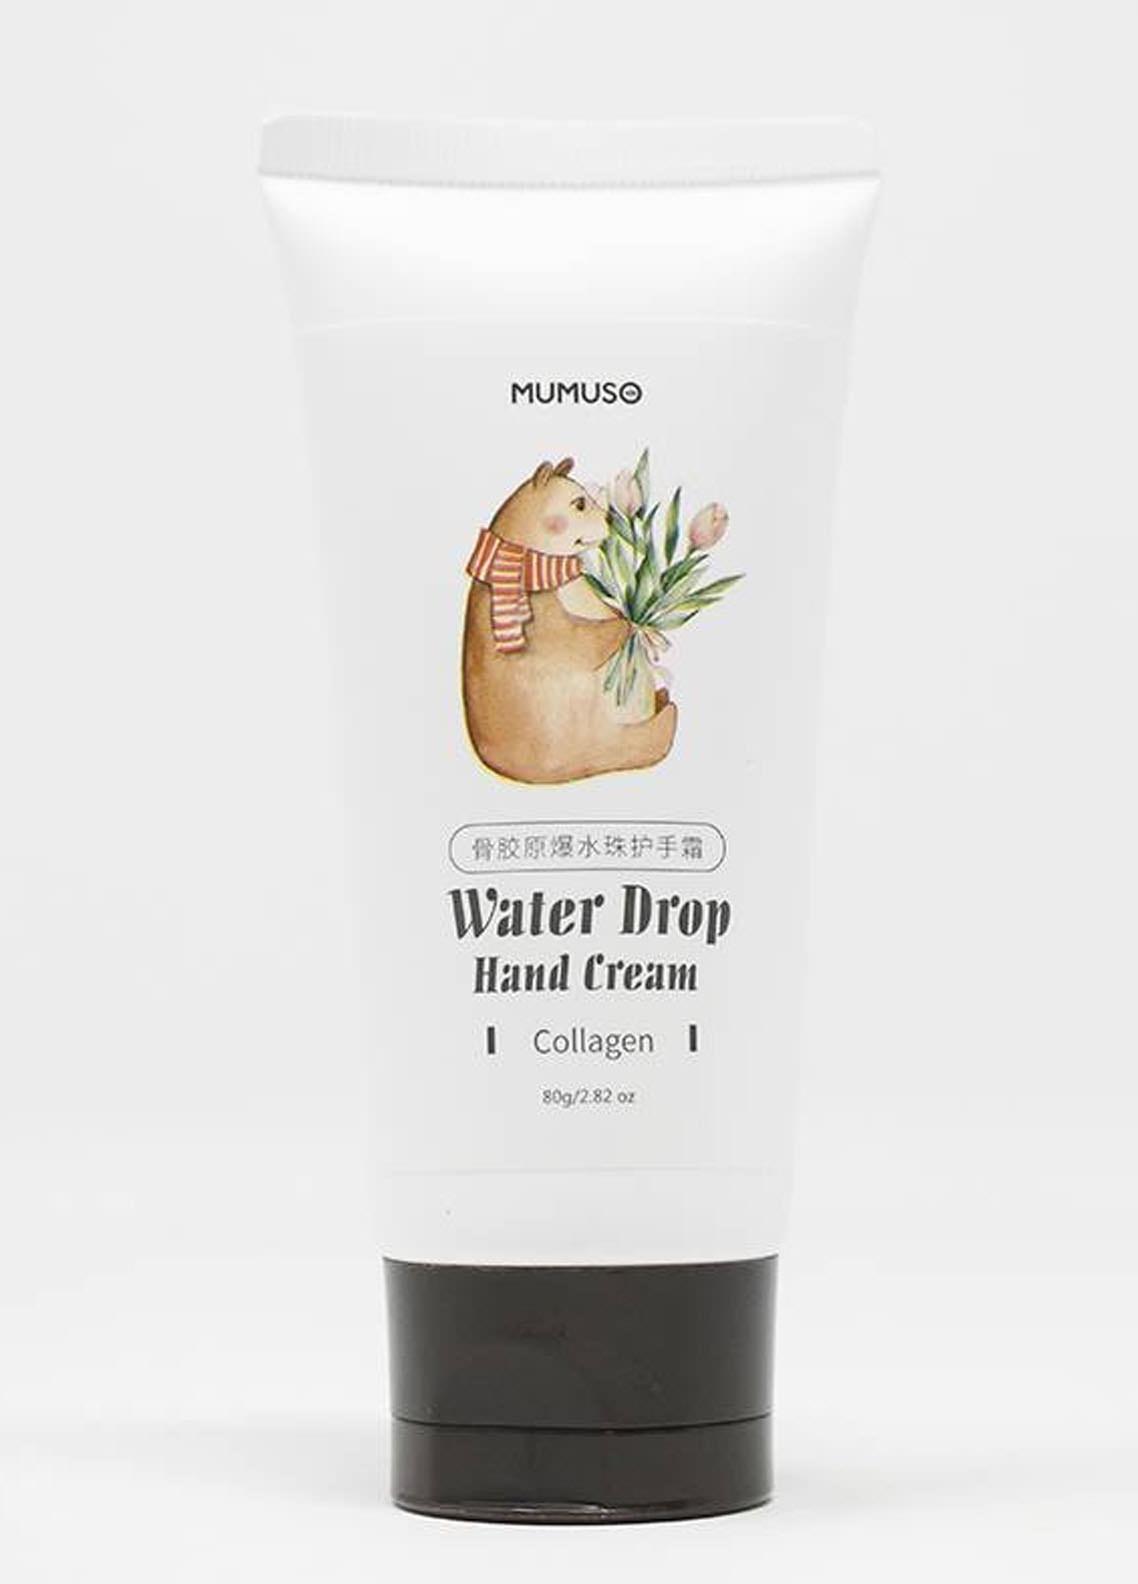 Mumuso Water Drop Hand Cream